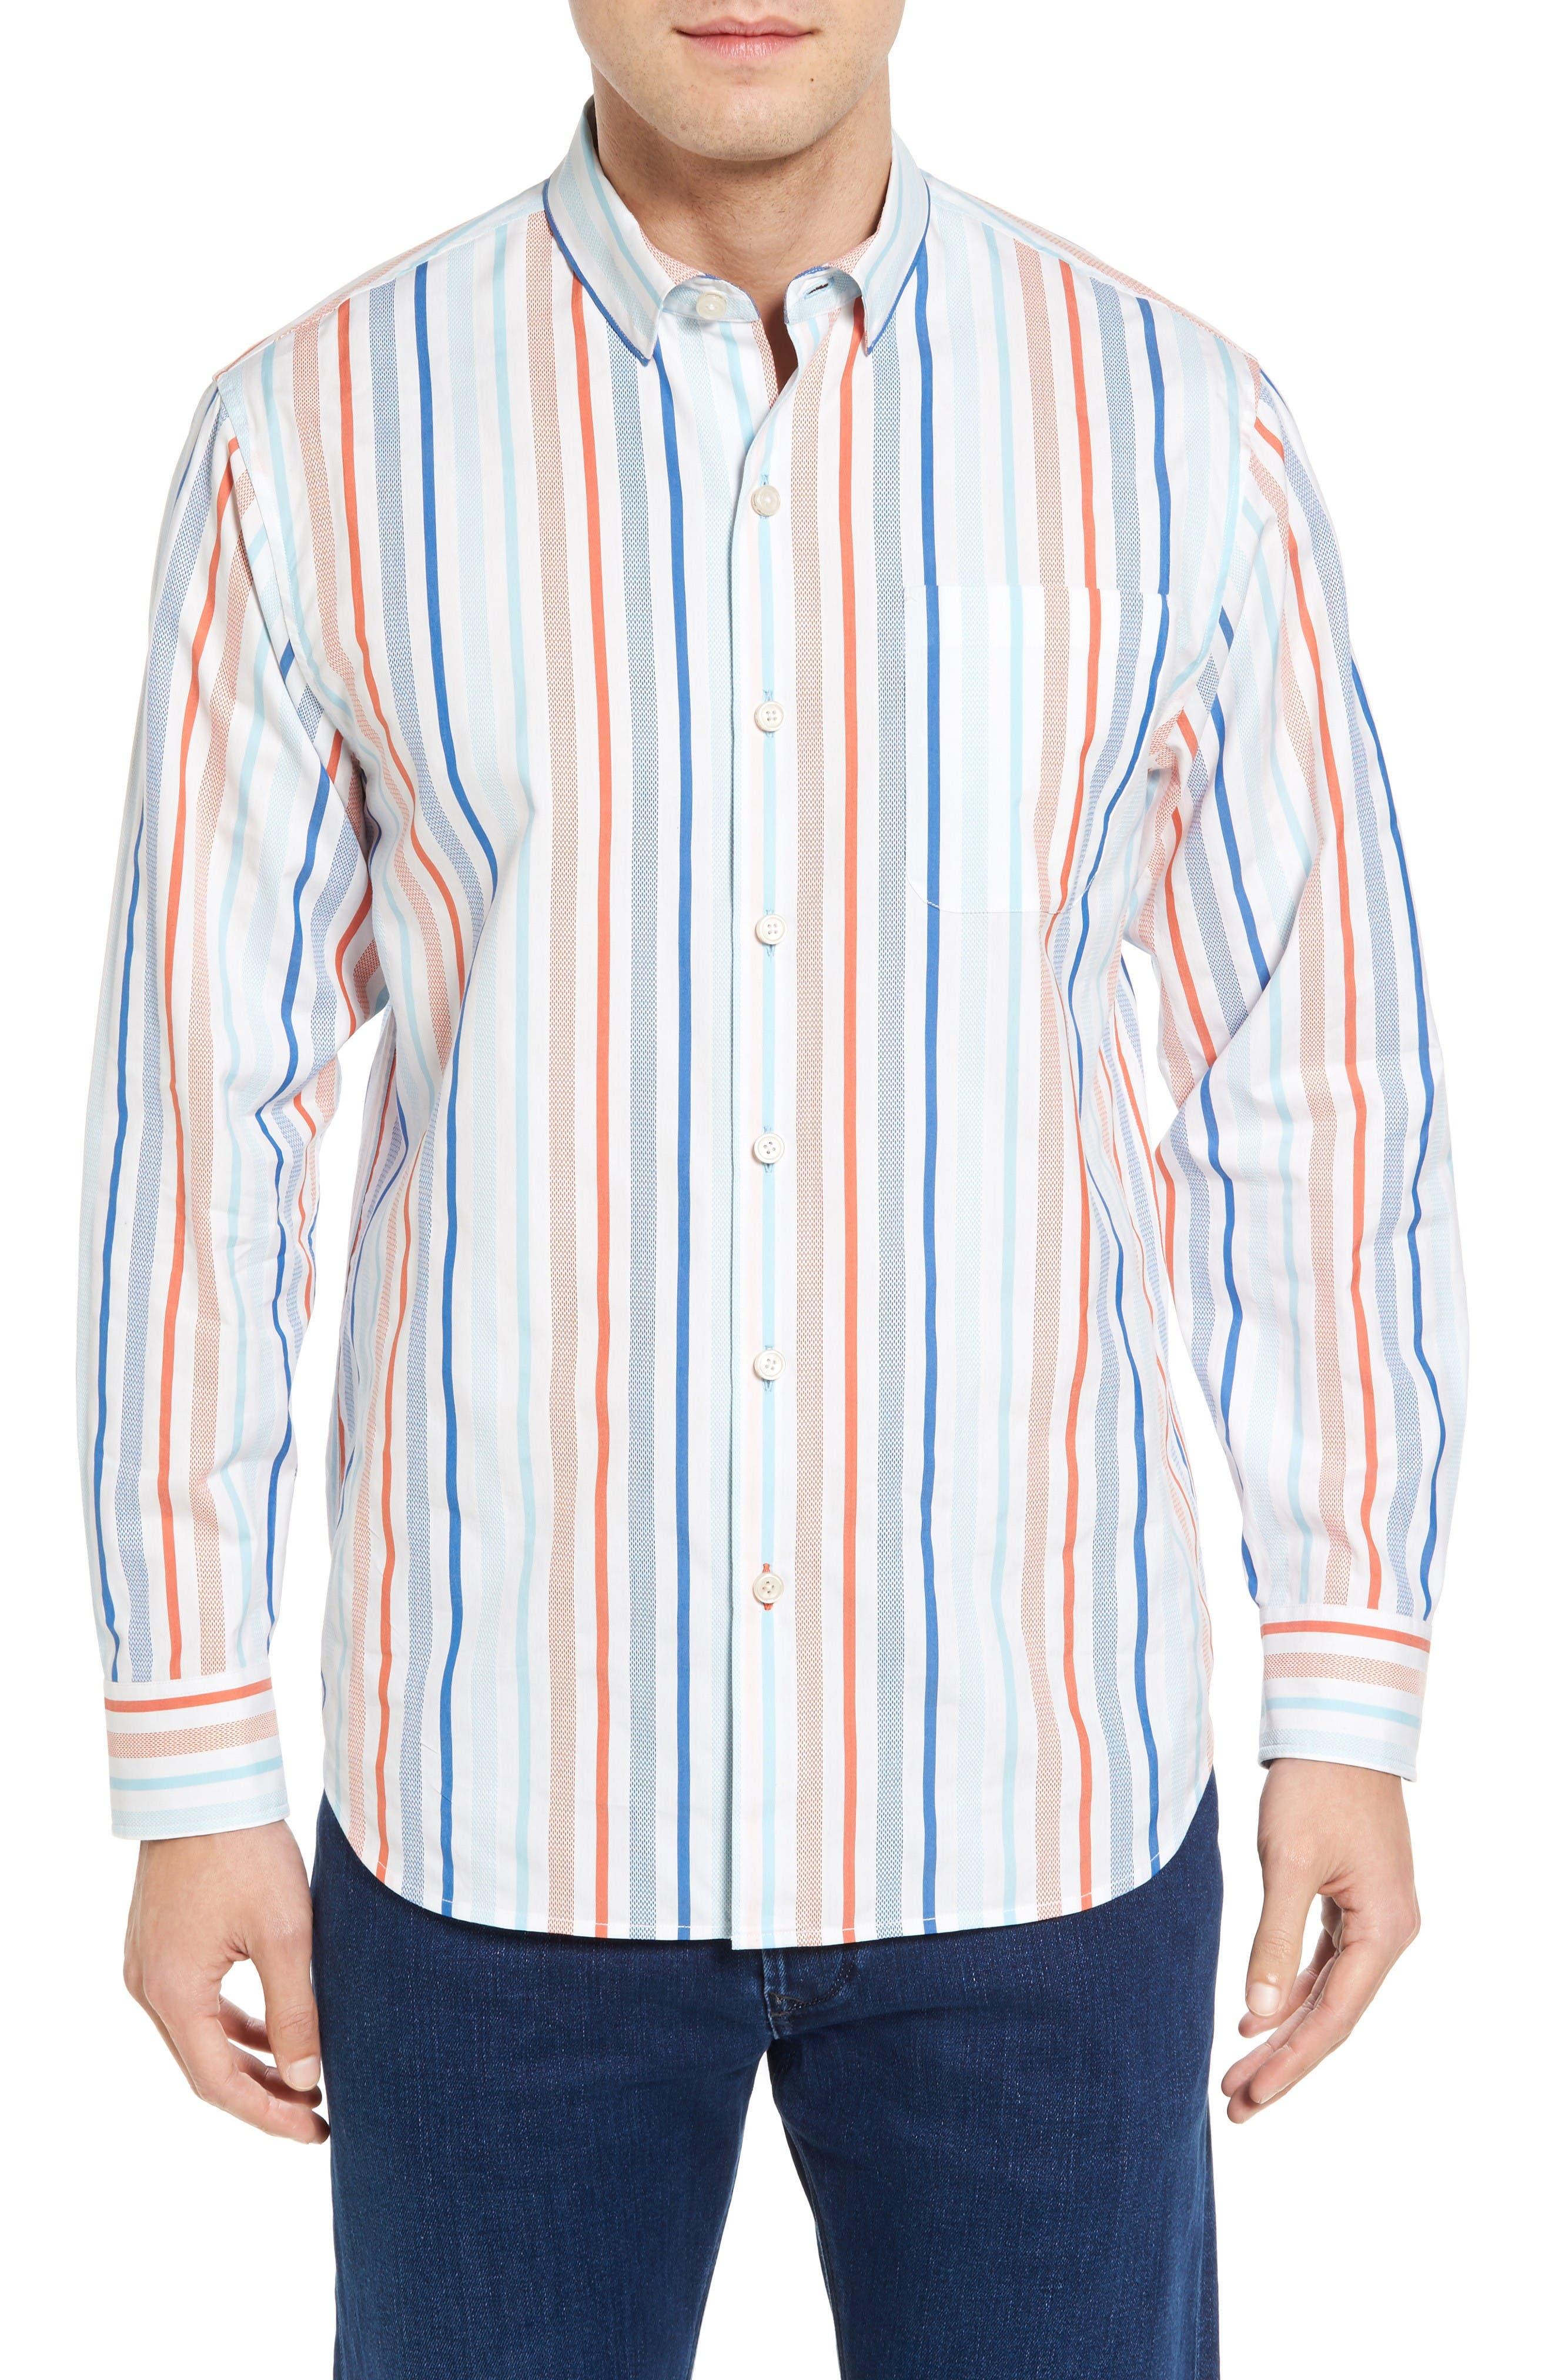 Main Image - Tommy Bahama Demeter Stripe Sport Shirt